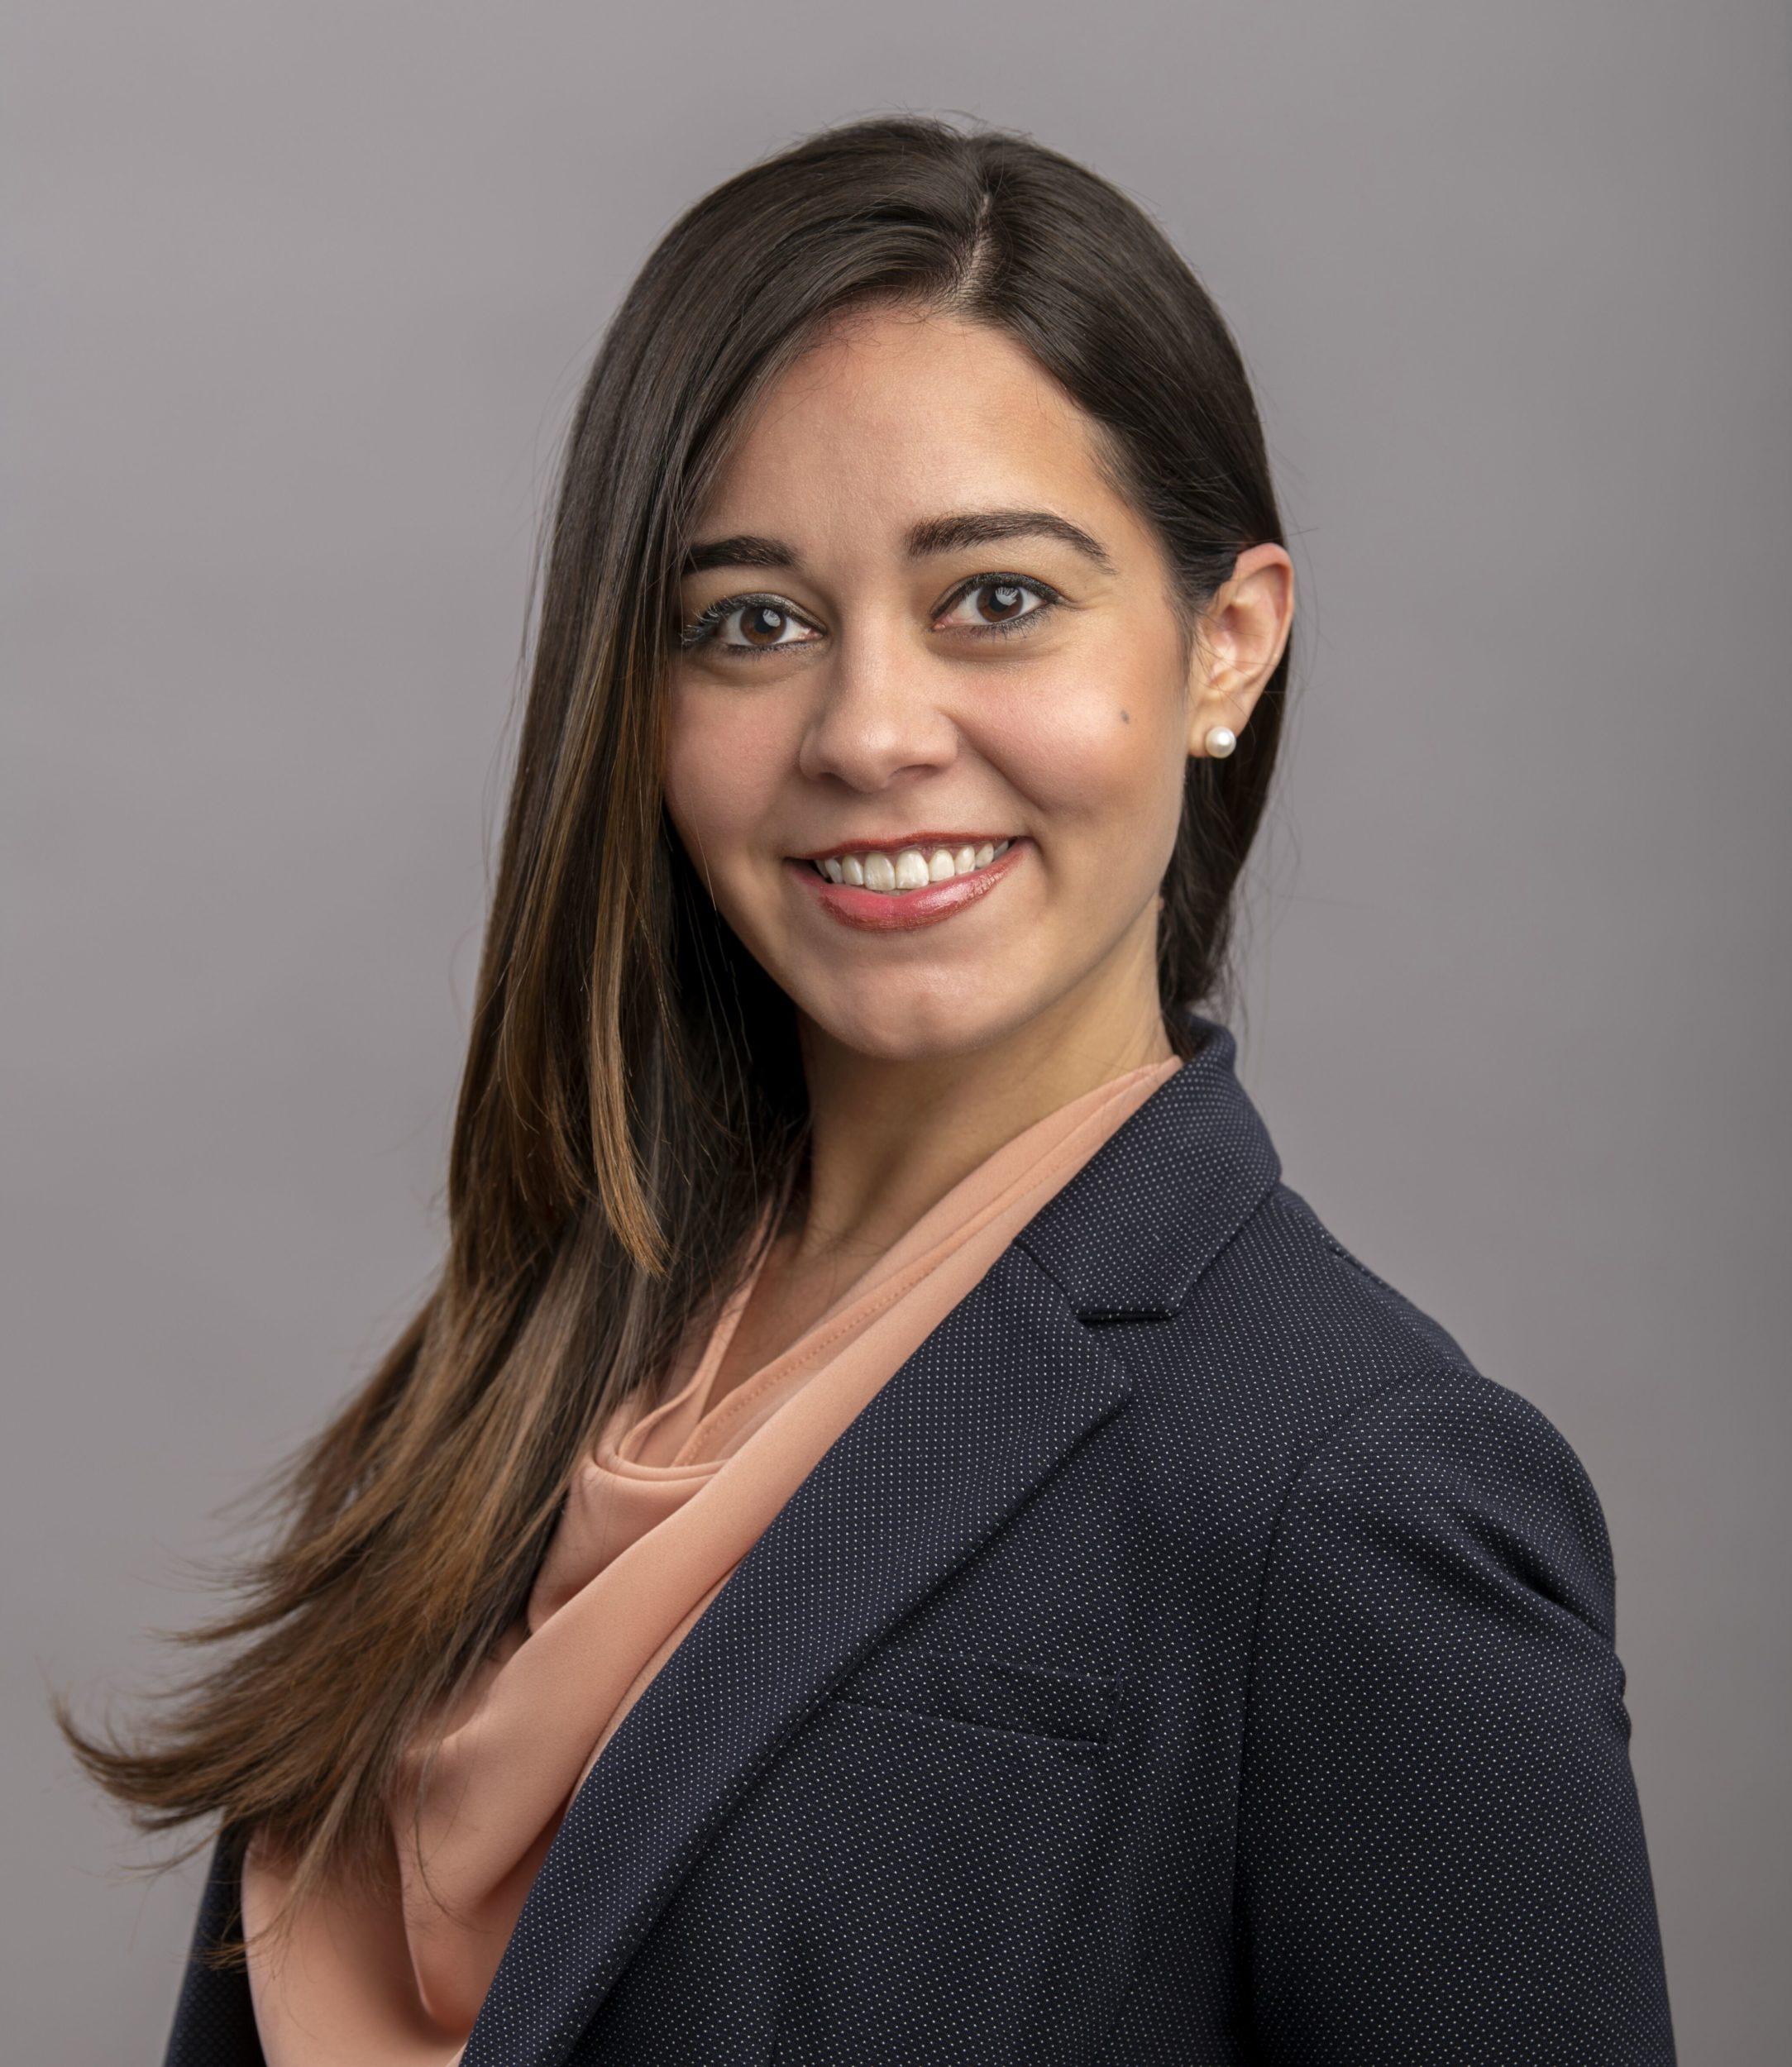 Madeline Fajardo